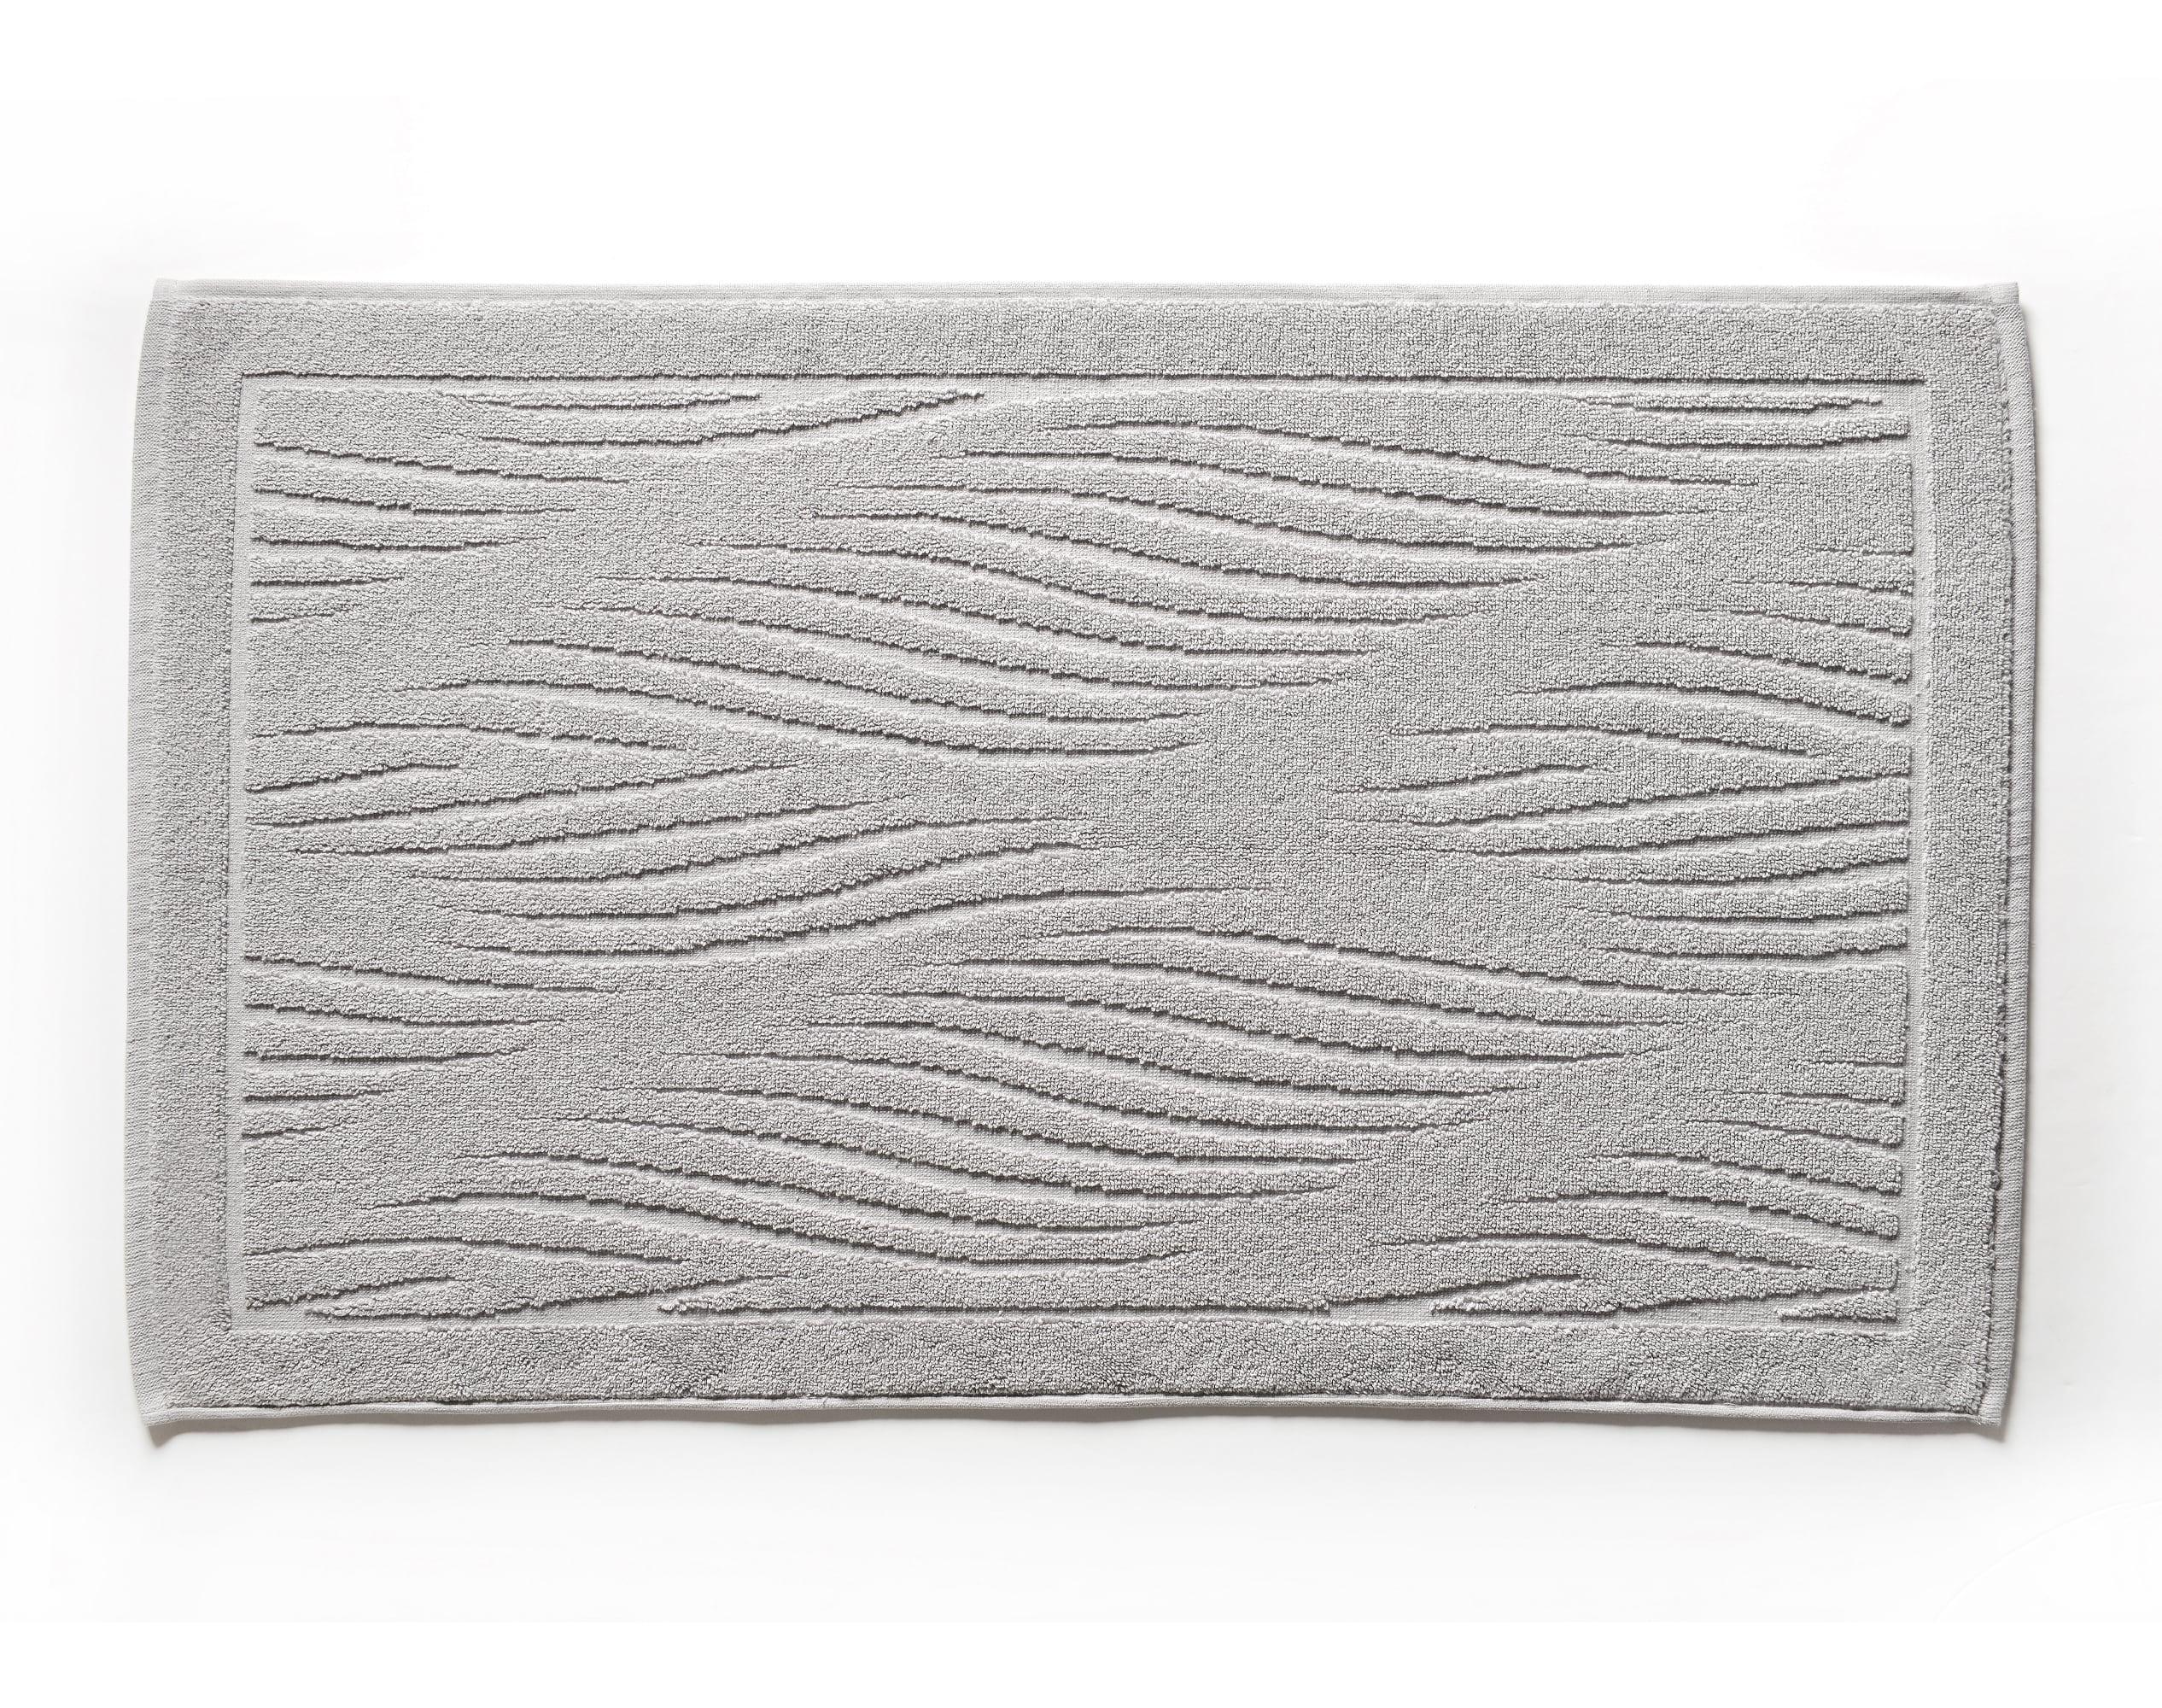 Tapis de bain gris perle 100x60 en coton